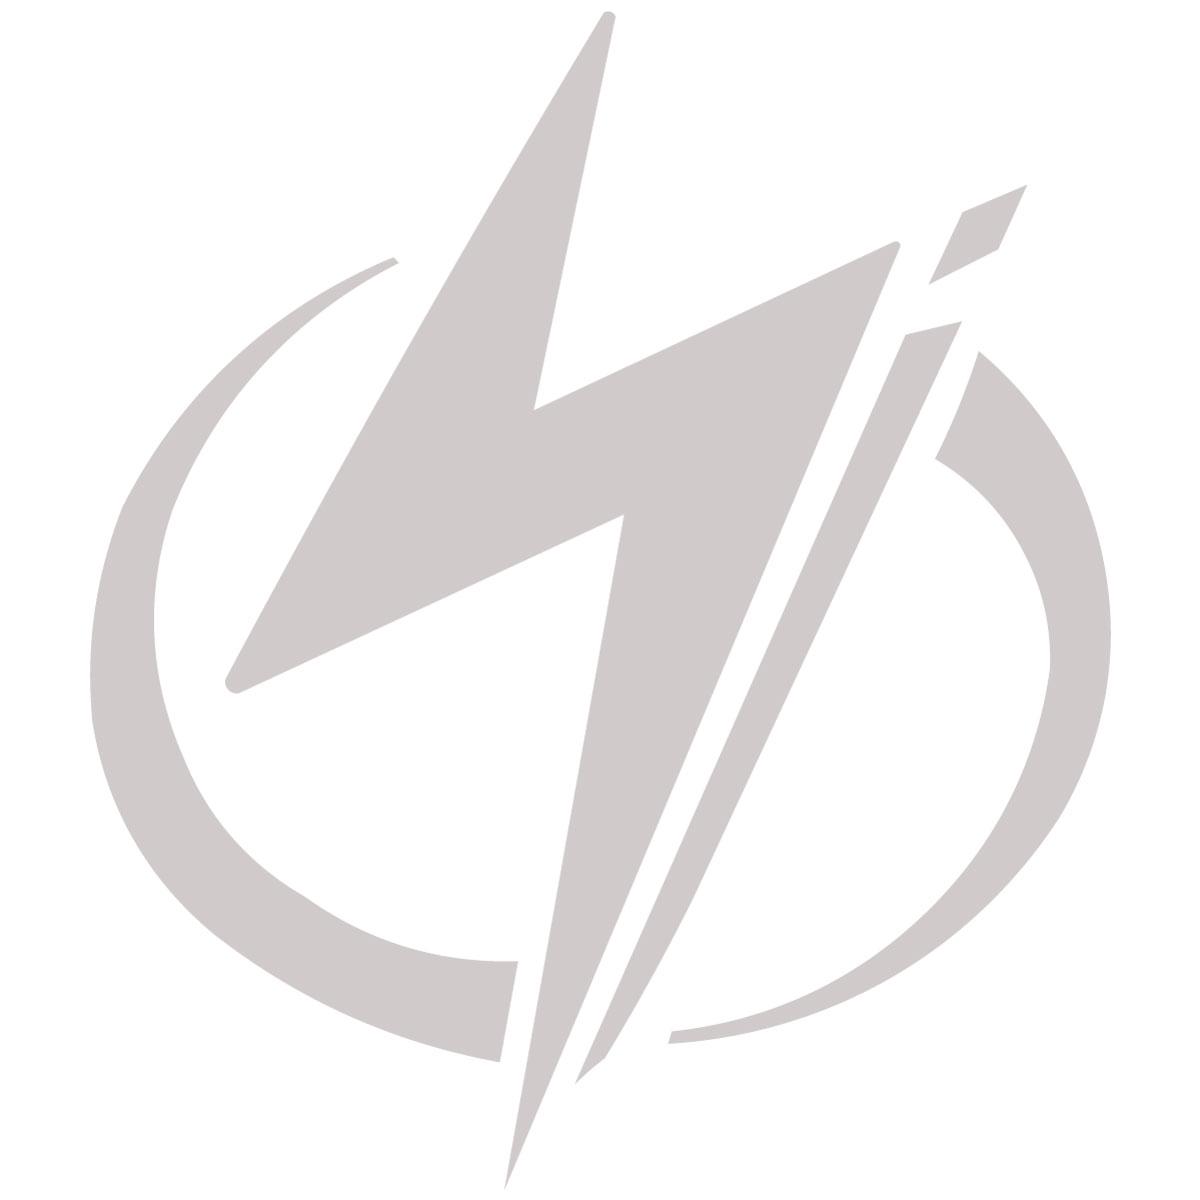 SiForce Lightning NX  (Designed for Nuix)